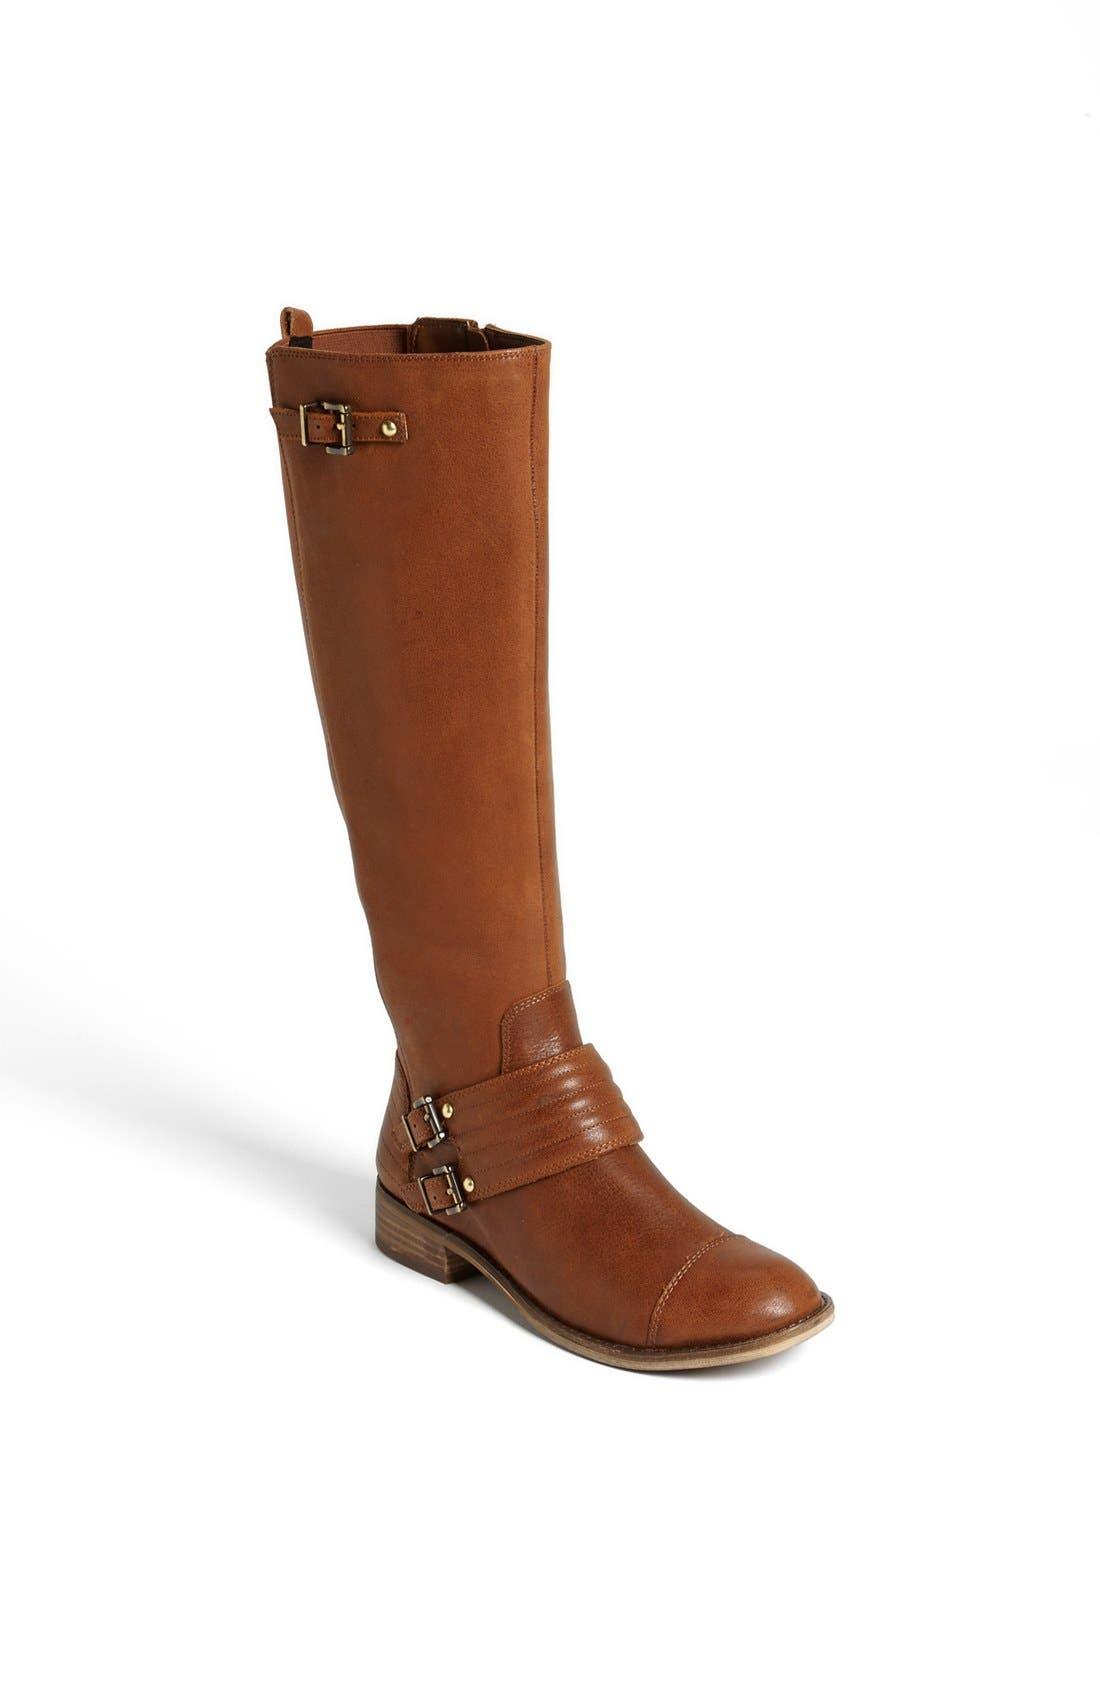 Main Image - Jessica Simpson 'Elmont' Boot (Wide Calf)